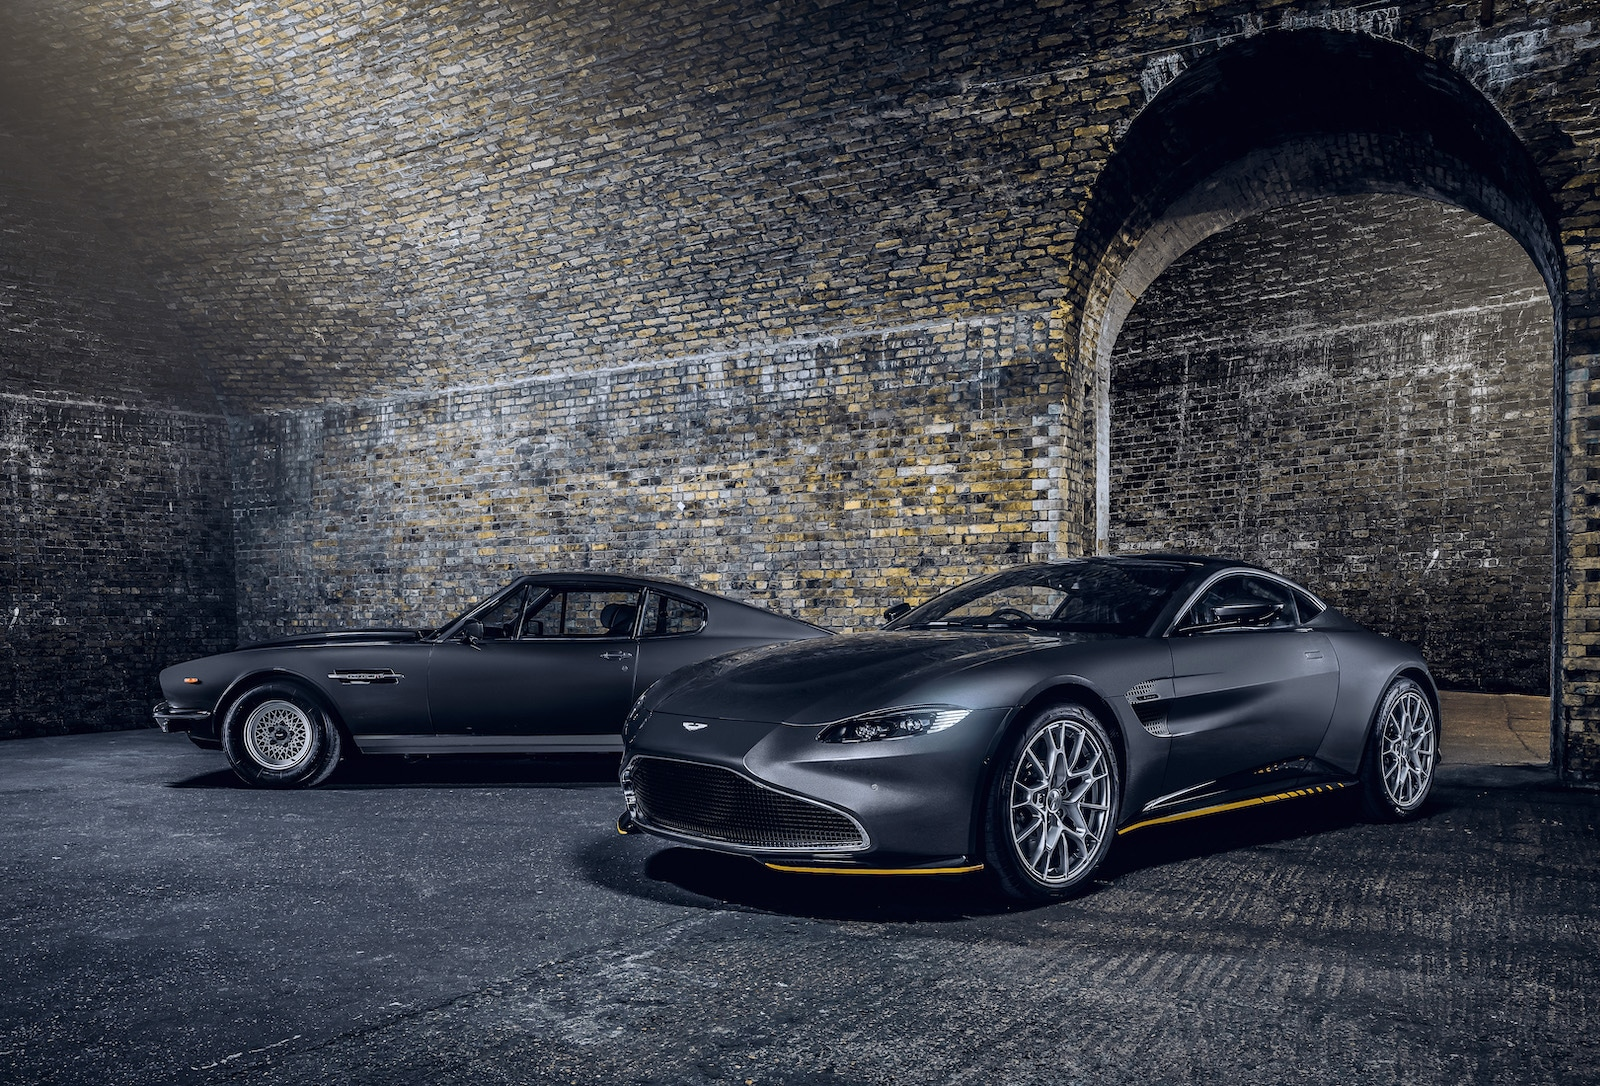 Aston Martin Celebrates New Bond Film With Two Special Editions The Detroit Bureau